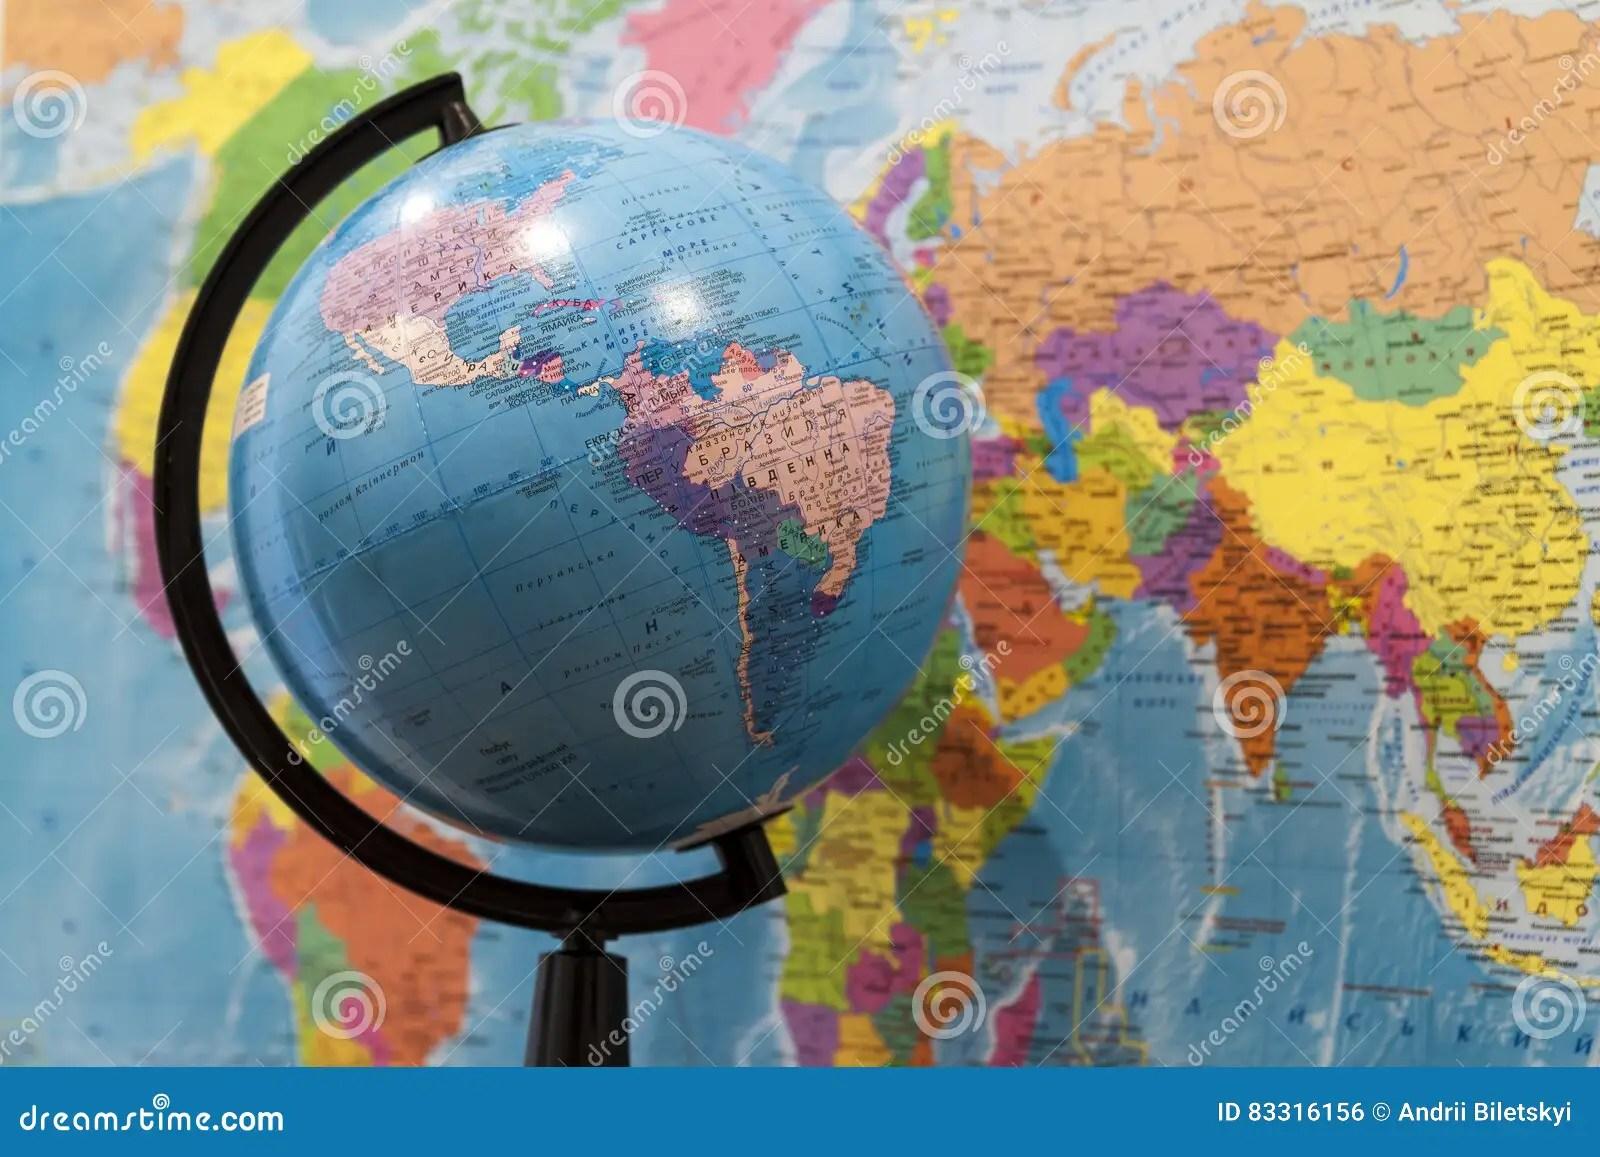 South America globe olitical world map